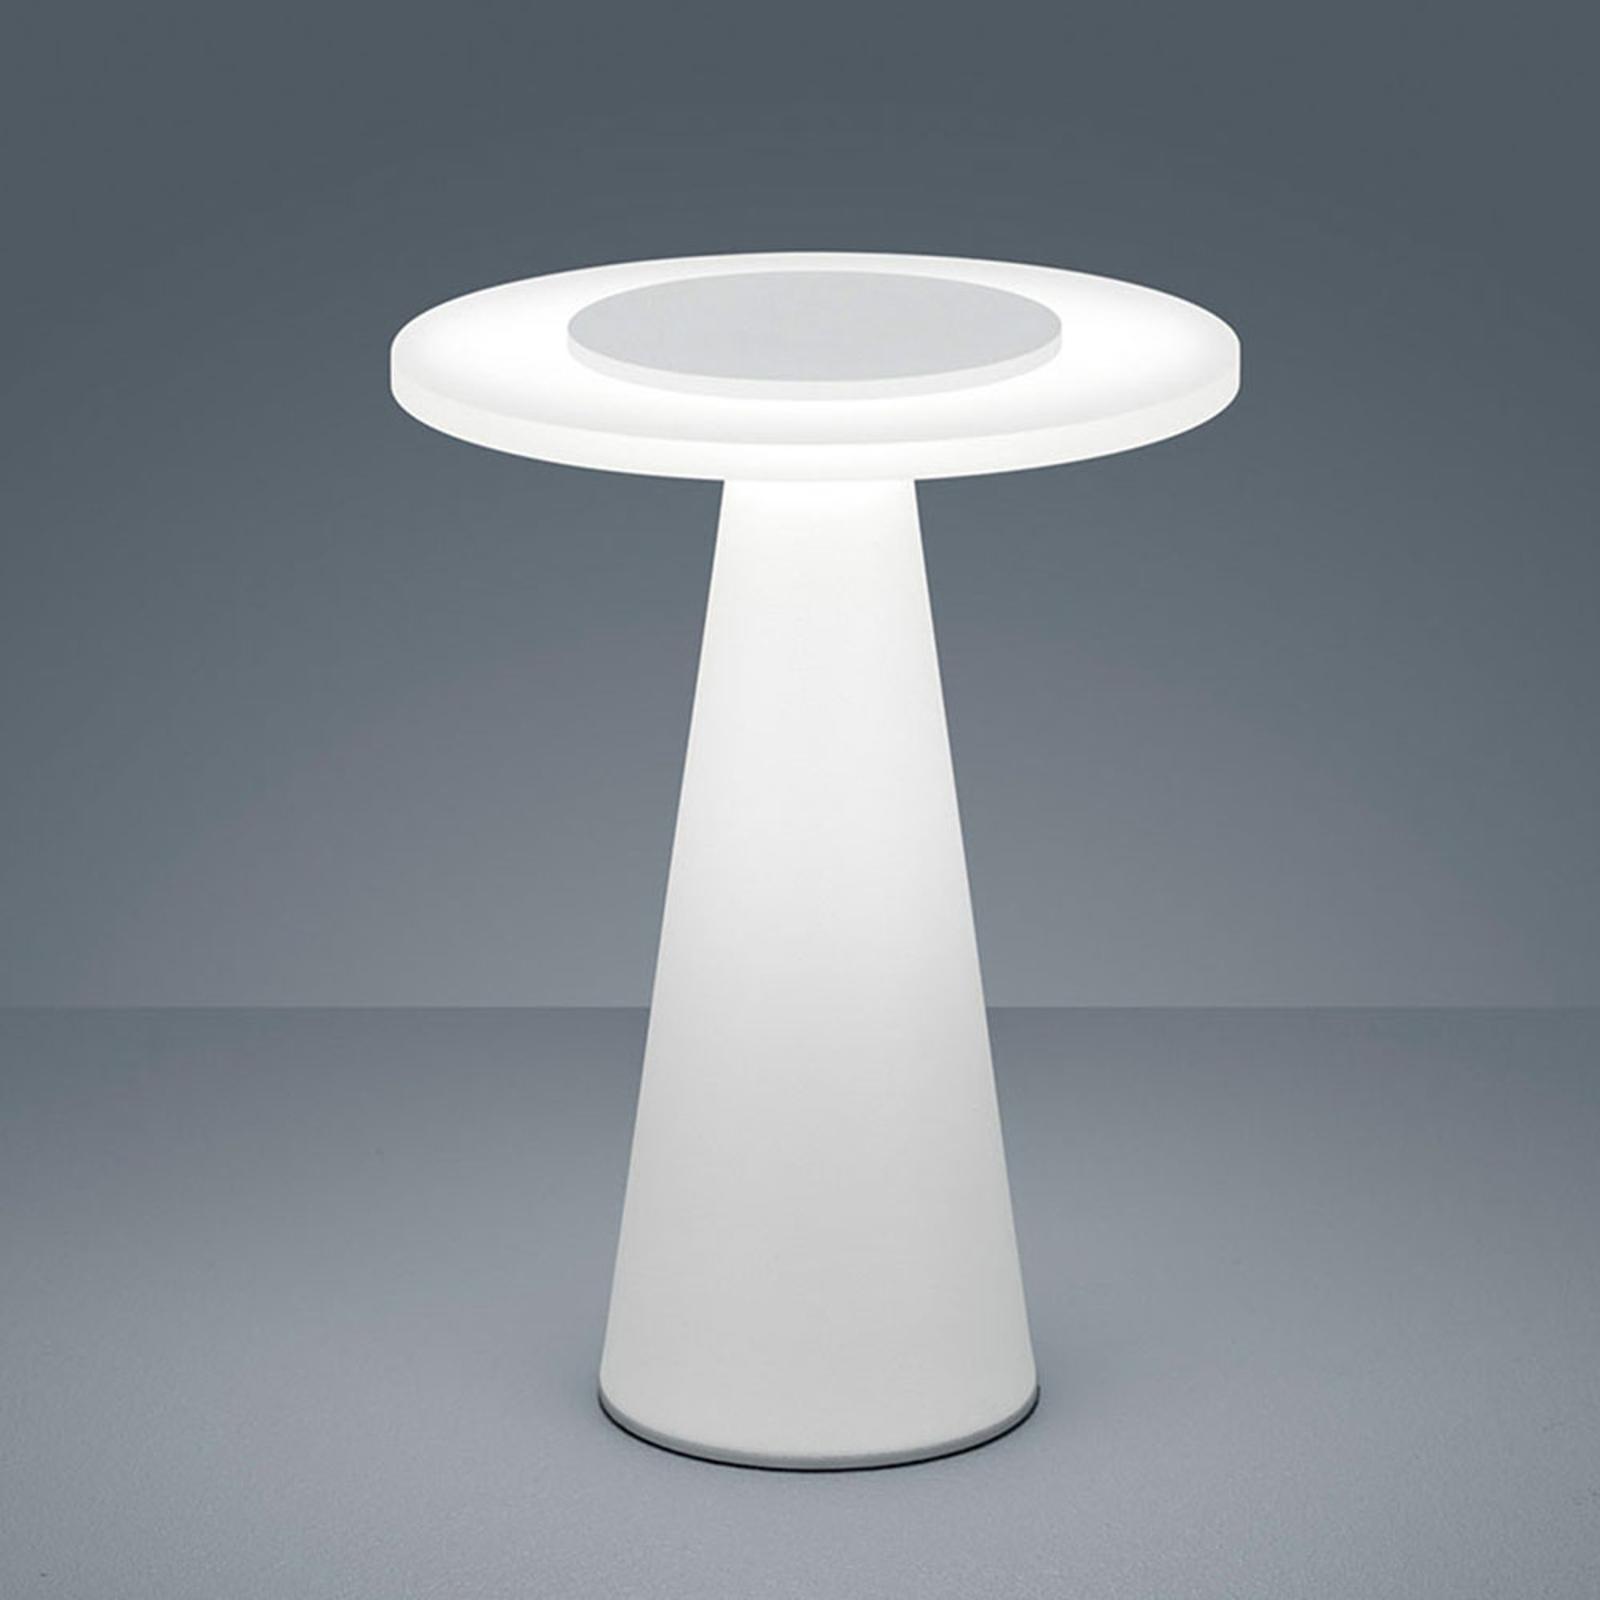 Helestra Bax tafellamp met touchdimmer, wit